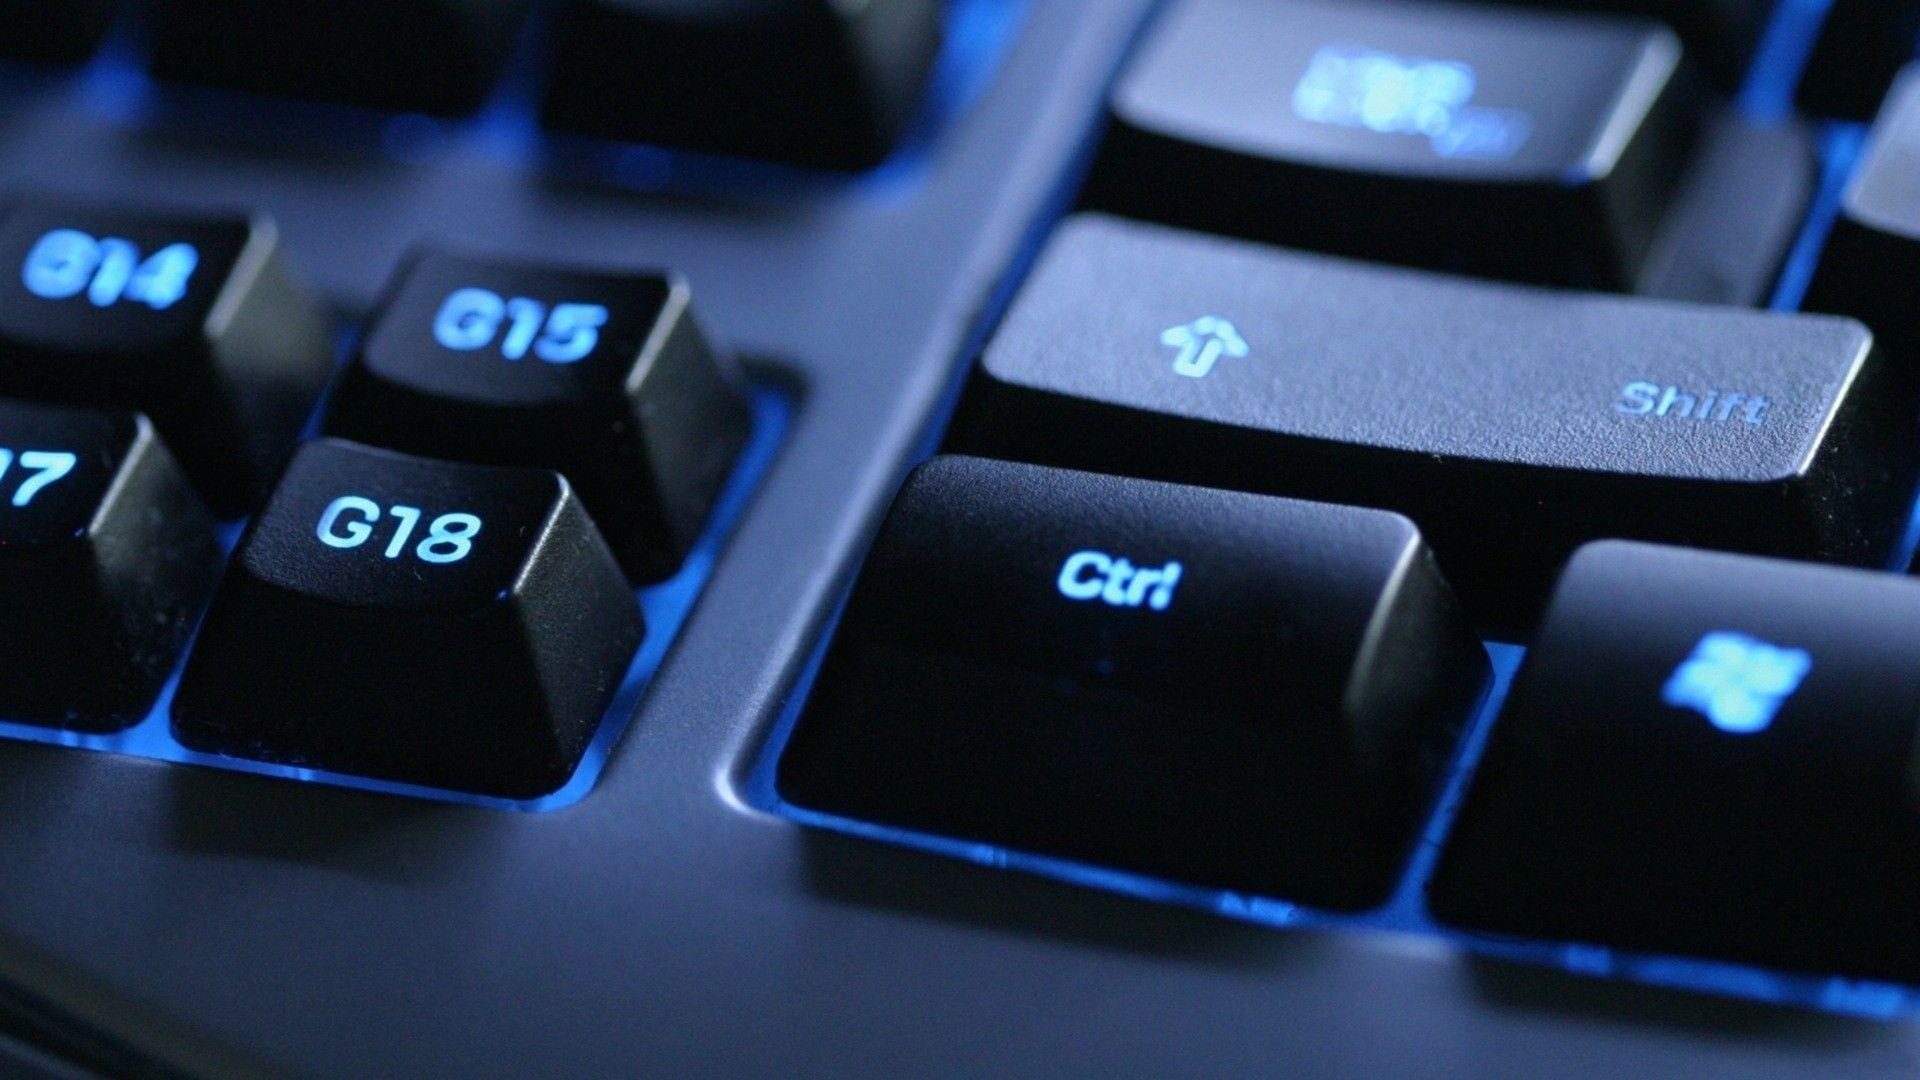 Full HD Keyboard Wallpapers   Top Free Full HD Keyboard ...